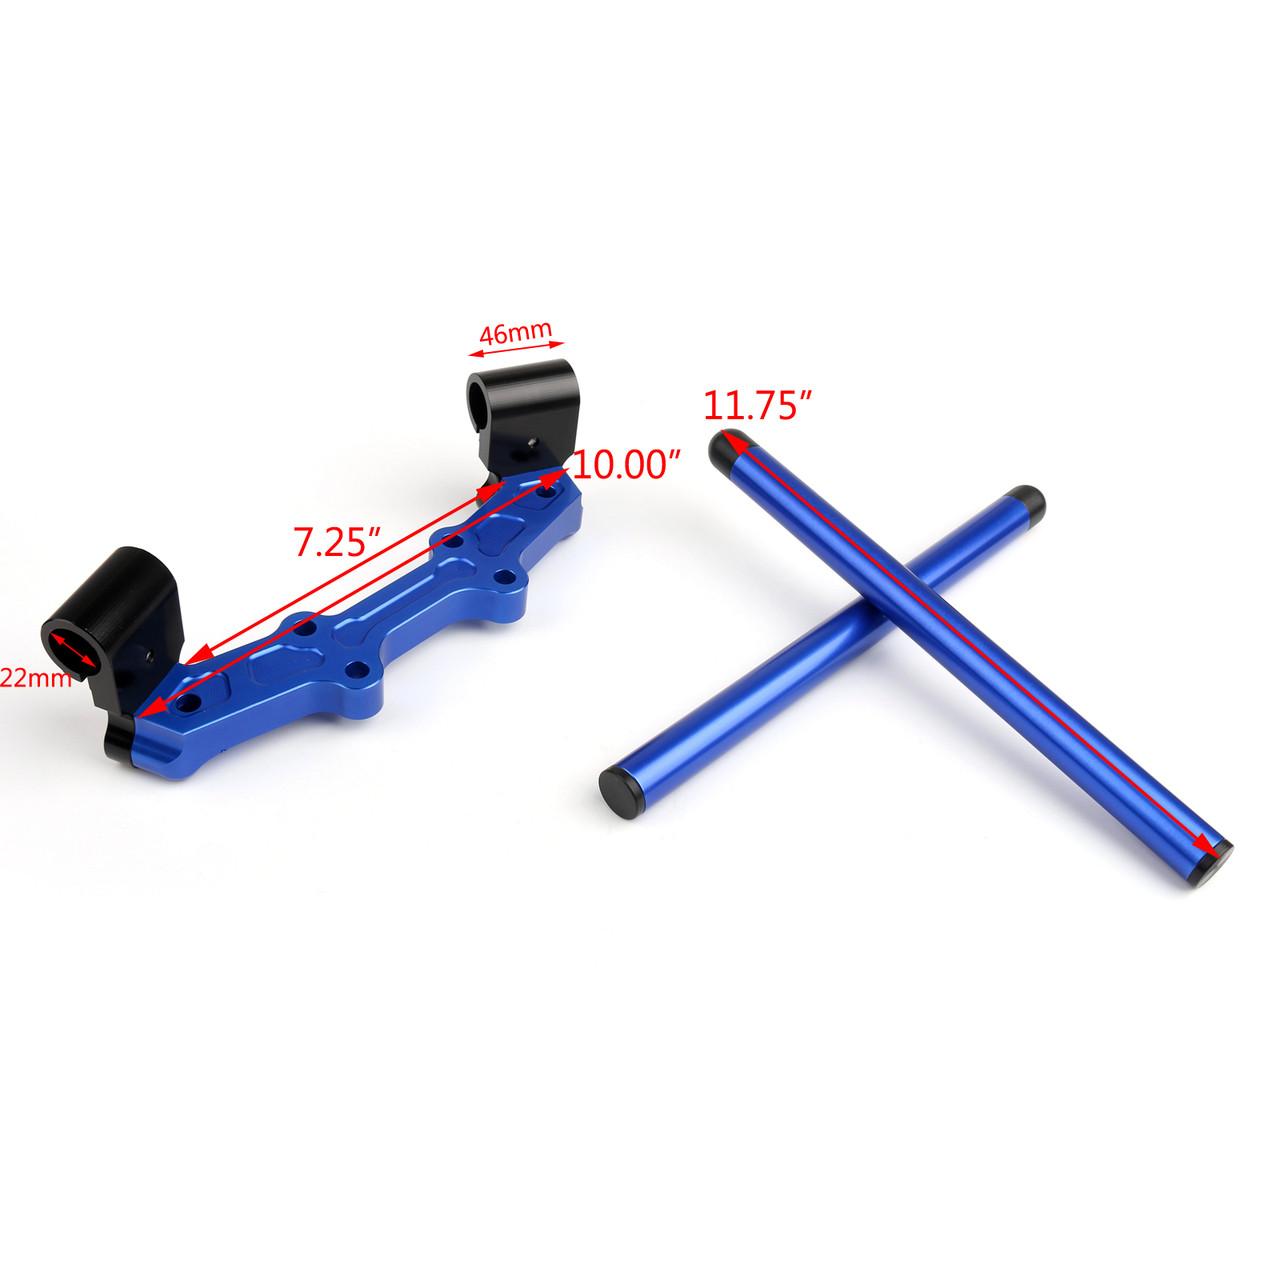 http://www.madhornets.store/AMZ/MotoPart/Grip/Grip-595/Grip-595-Blue-4.jpg